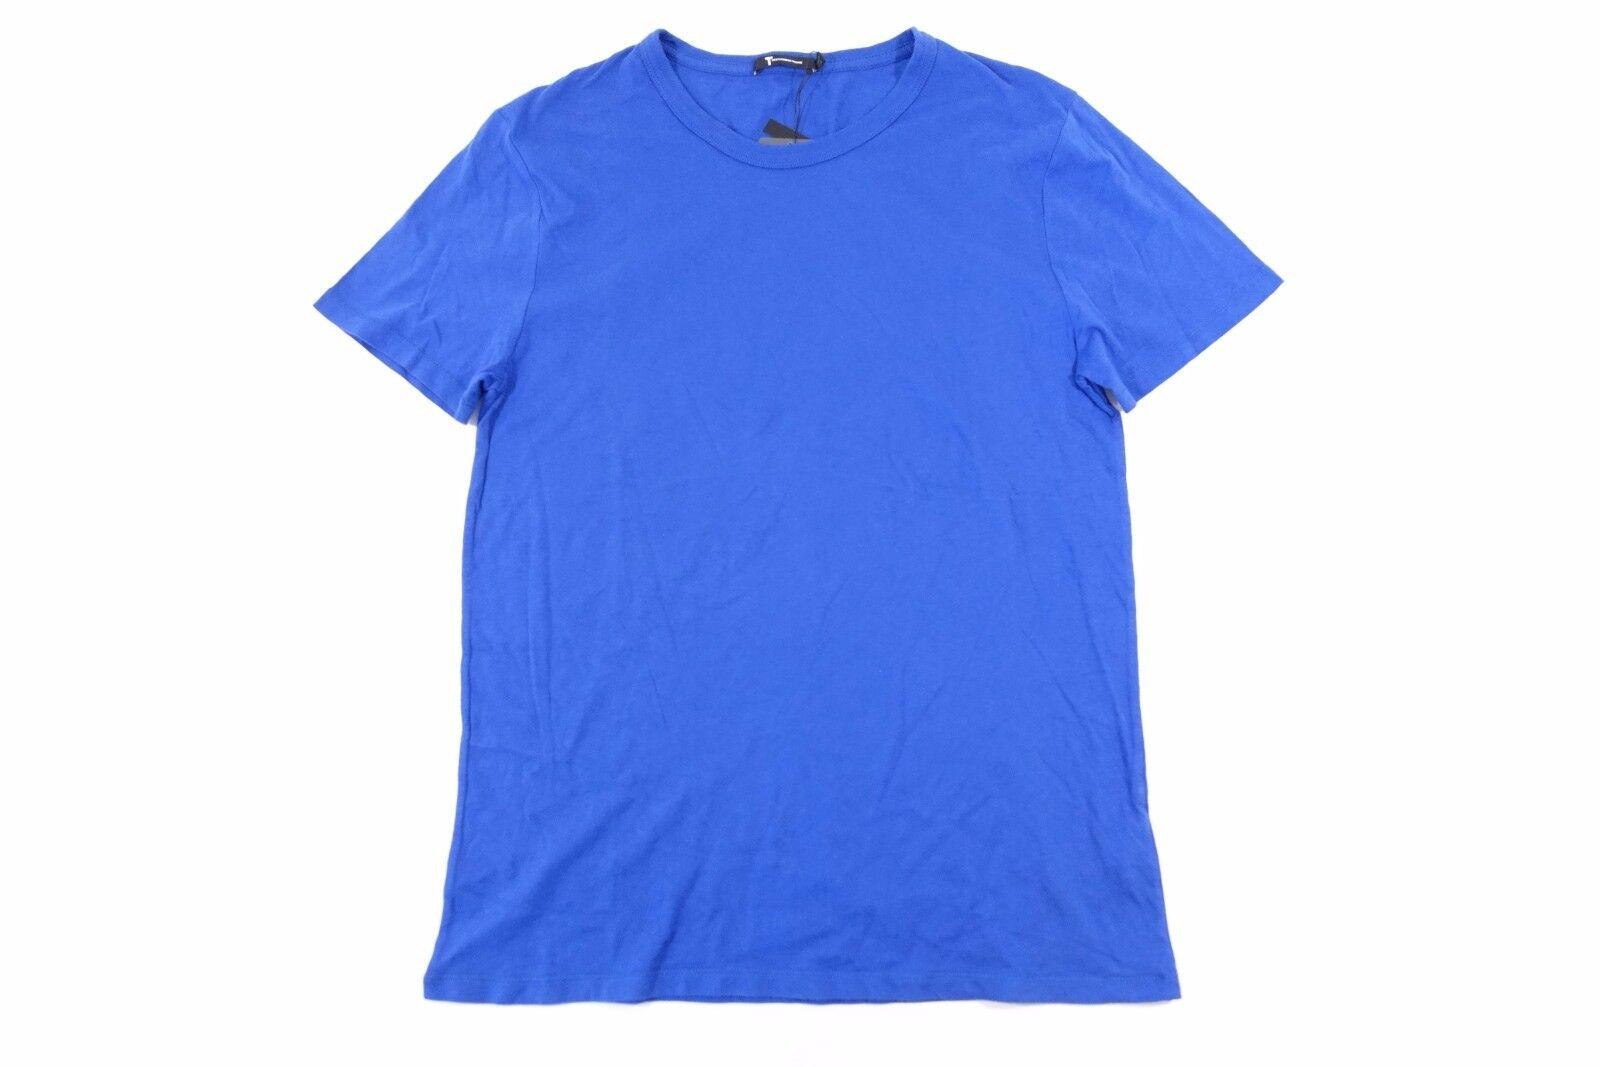 T ALEXANDER WANG 500200S17 blueE LARGE SOFT TSHIRT MENS NWT NEW